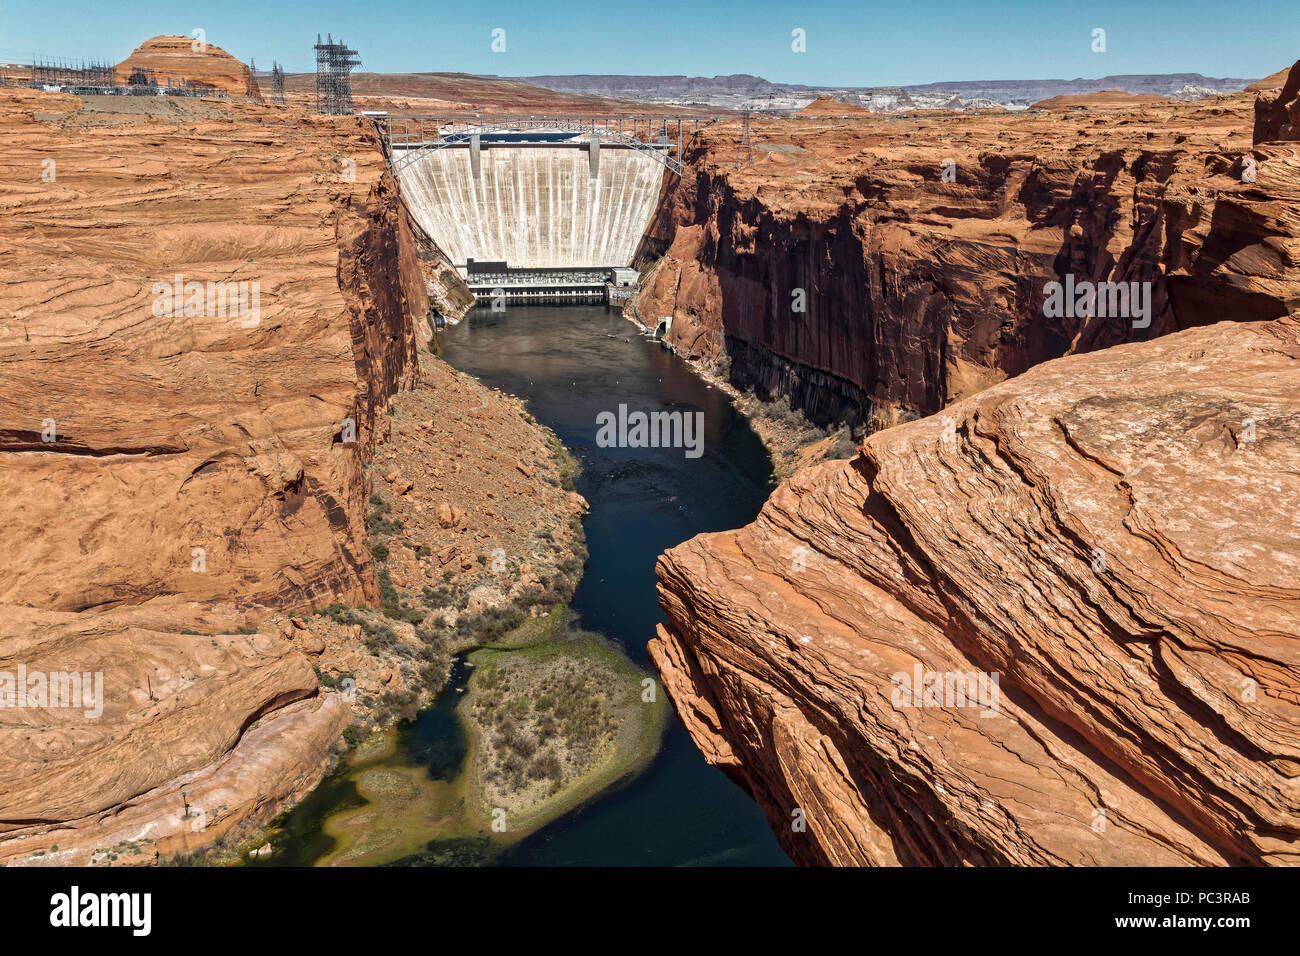 Glen Canyon Dam, Page, Arizona - Stock Image